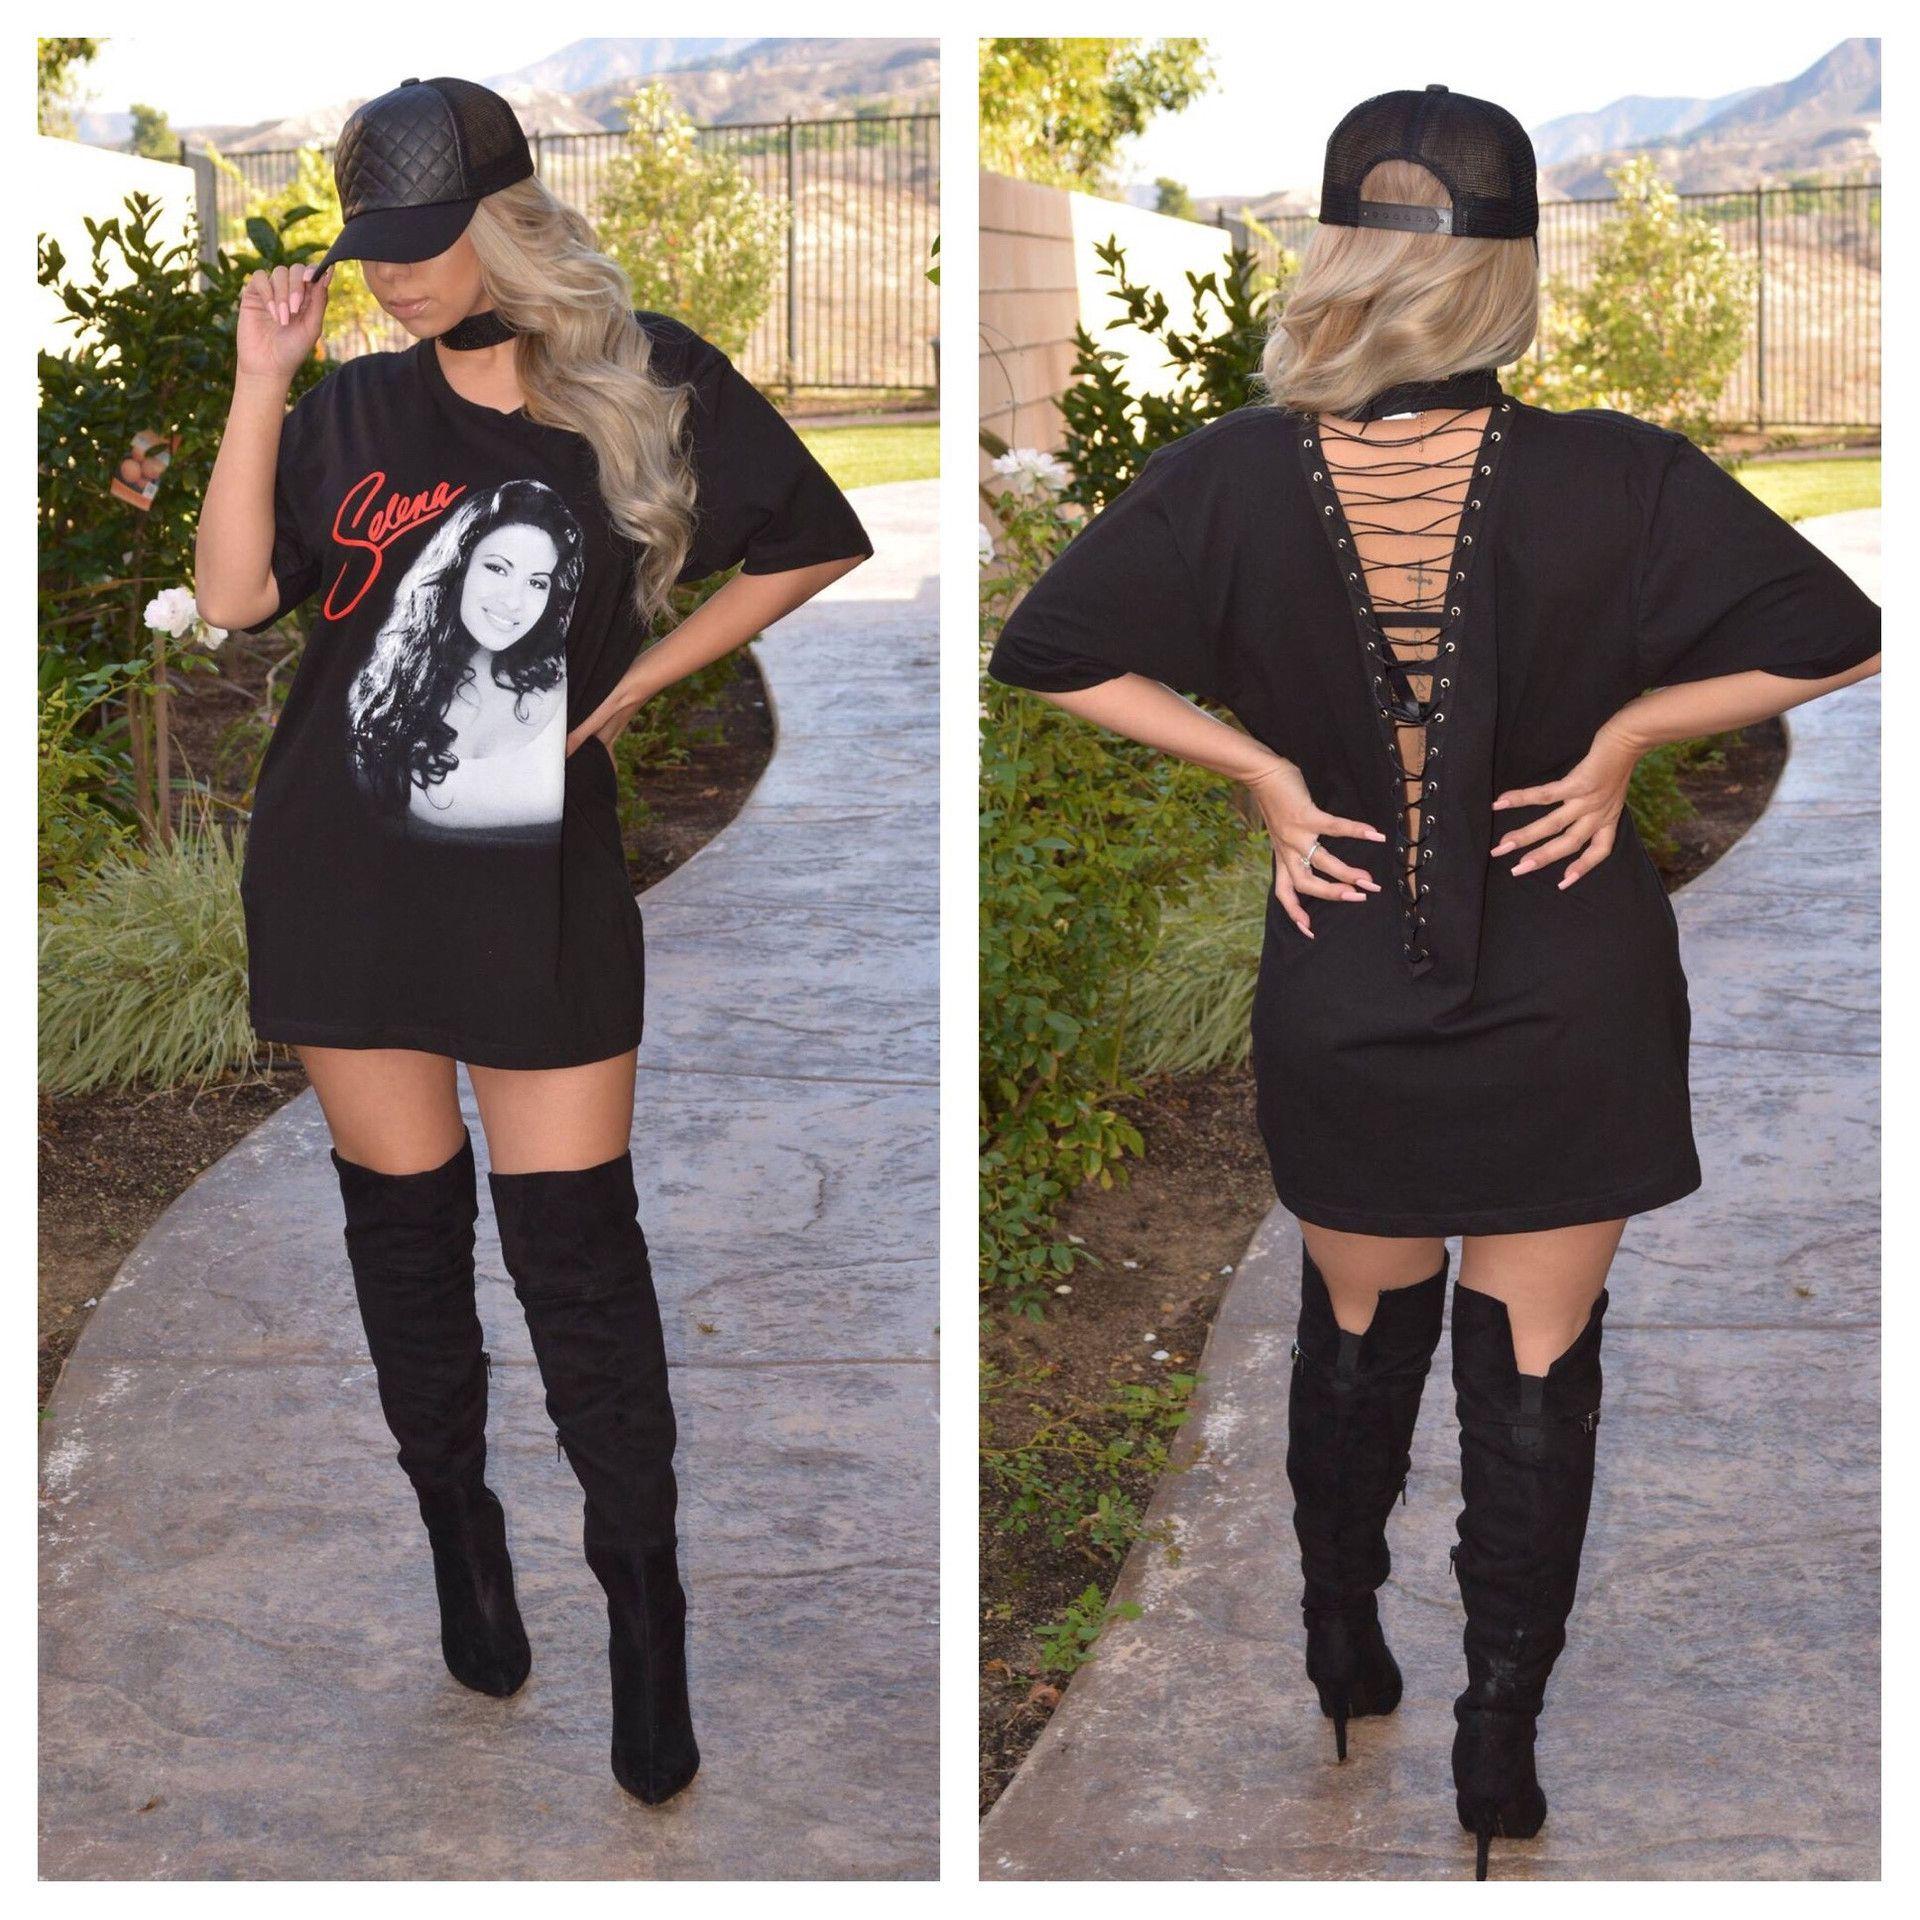 Shirt design online uk - Womens Tshirt Sexy Lace Up Deep V Neck Black T Shirt 2017 Fashion Punk Rock Design Fashion Face Print Long Top Shirts Womens Long Tops